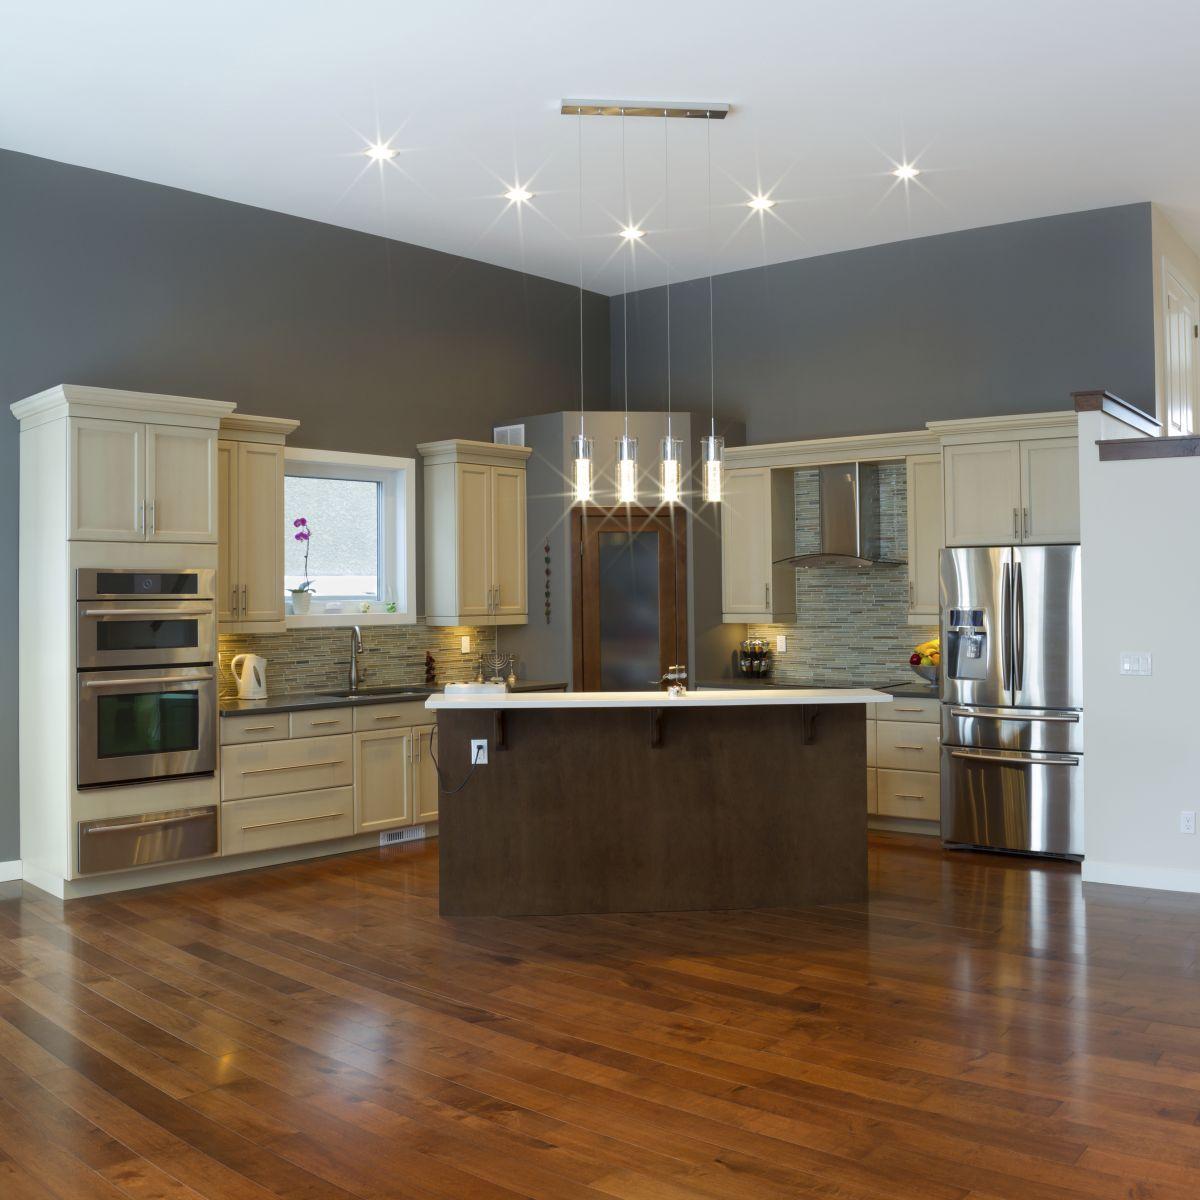 Hardwood Flooring Distributors Texas: Apex L T Development - Dallas, Texas